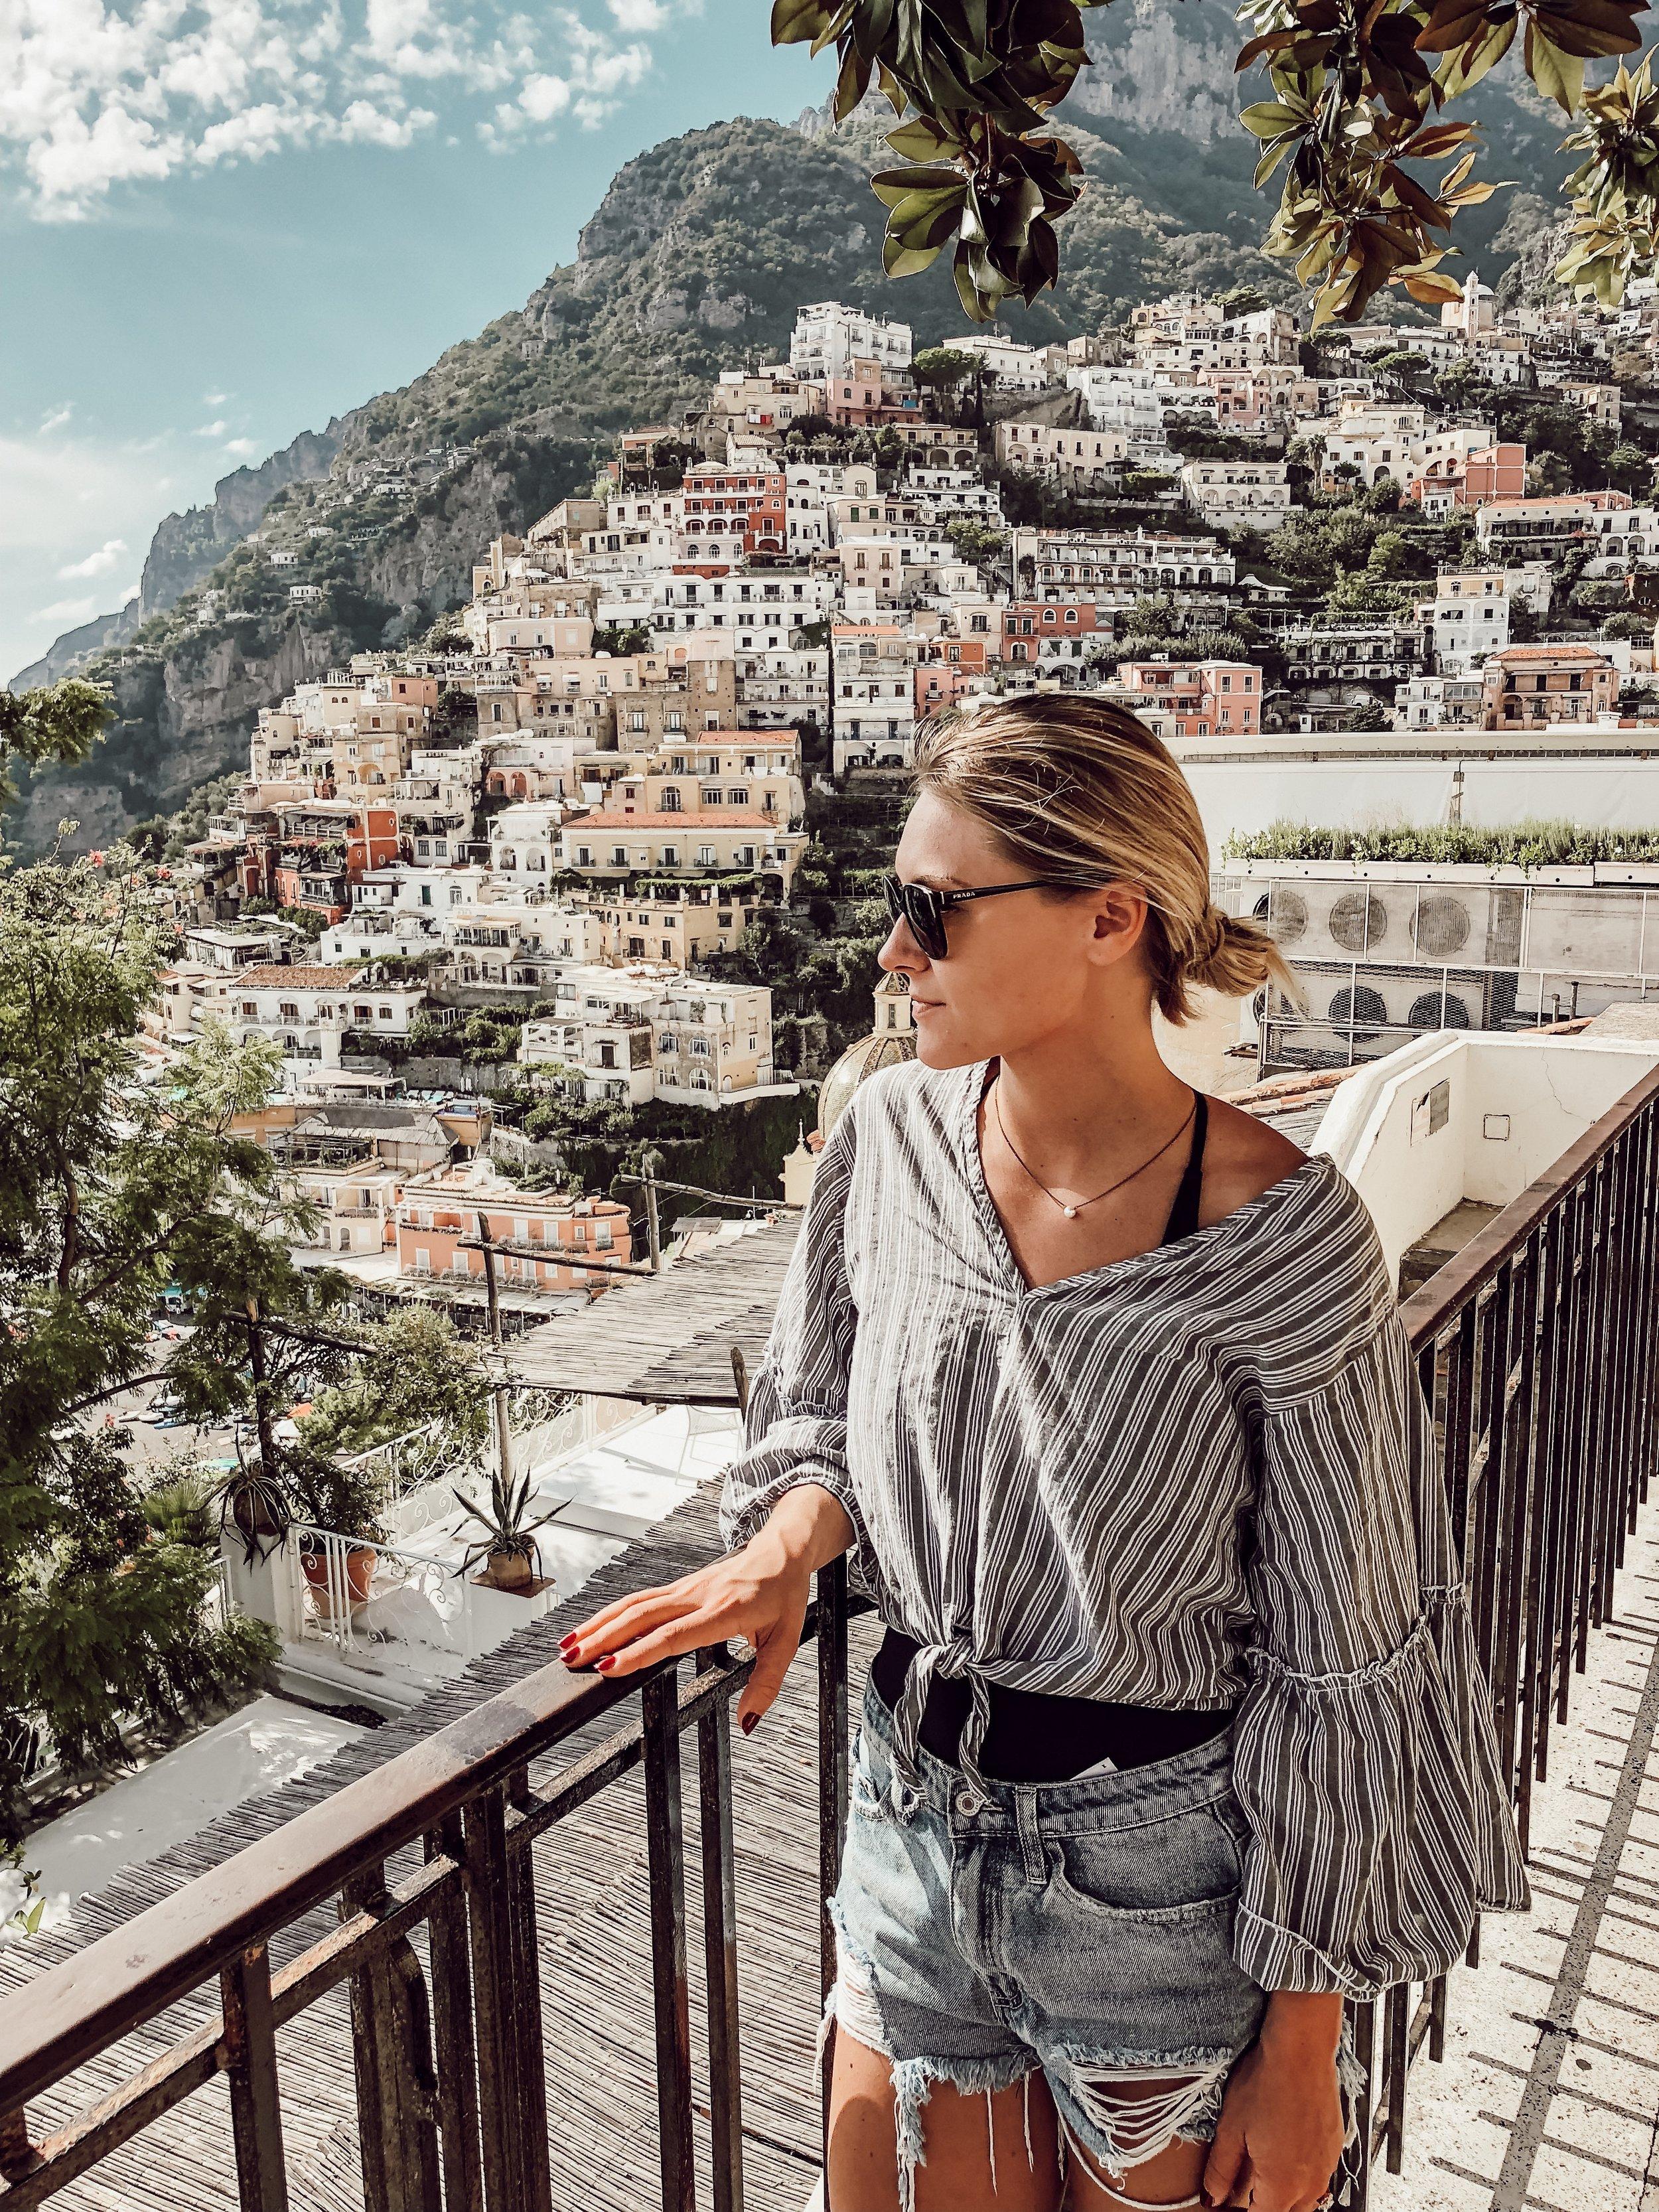 Positano Italy | Three Days on the Amalfi Coast, Amalfi Travel Guide, What to Do in Amalfi Italy | Miranda Schroeder Blog